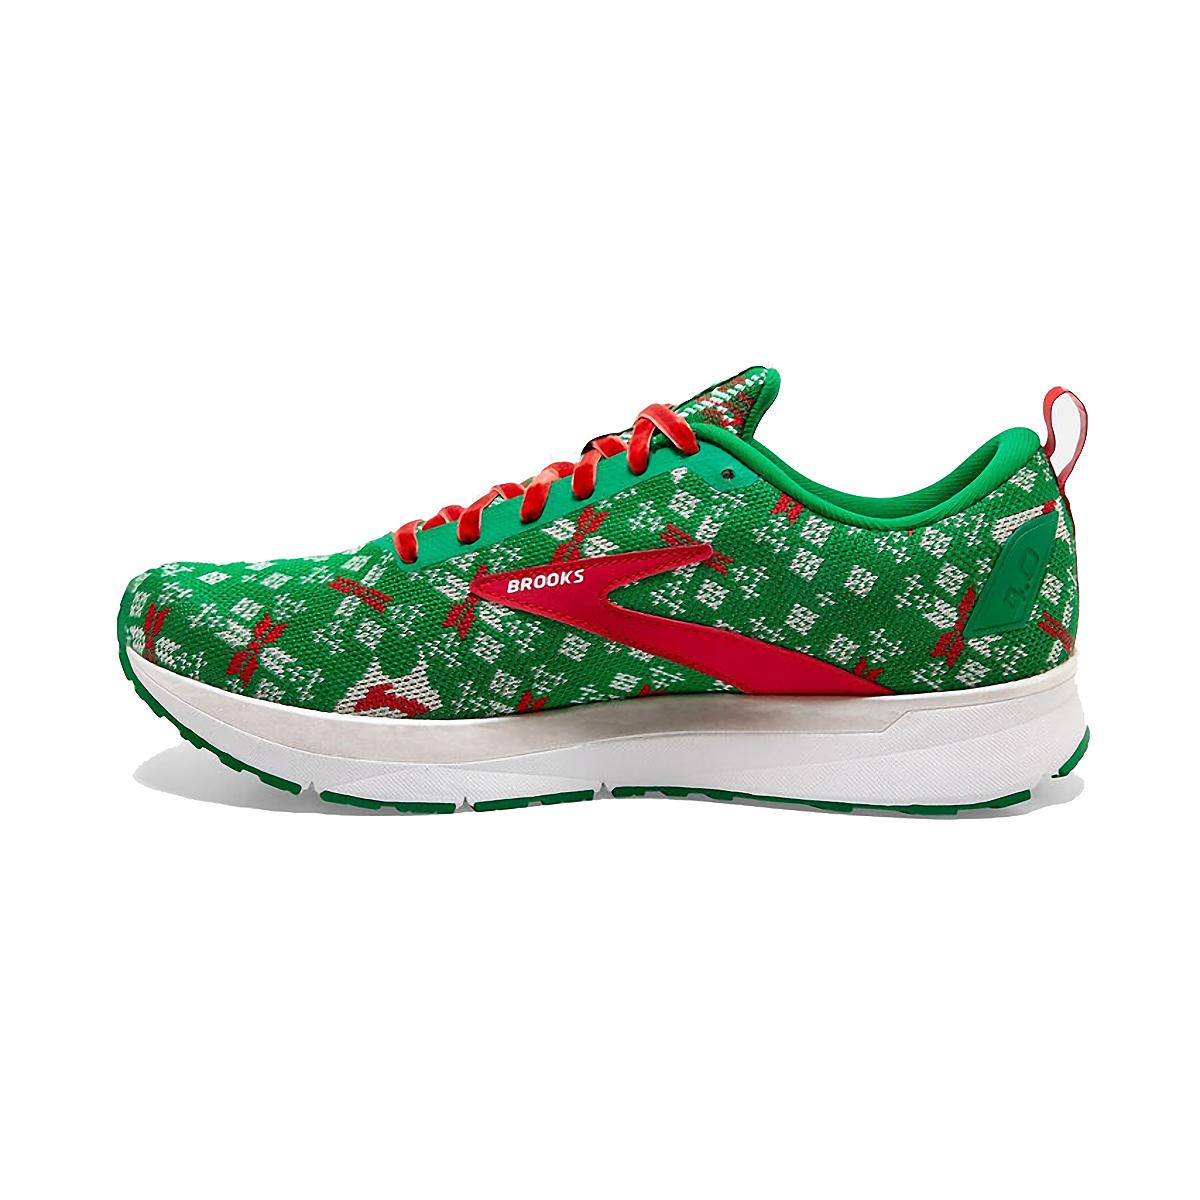 Men's Brooks Run Merry Revel 4 Running Shoe - Color: Jolly Green/Red/White - Size: 7 - Width: Regular, Jolly Green/Red/White, large, image 2